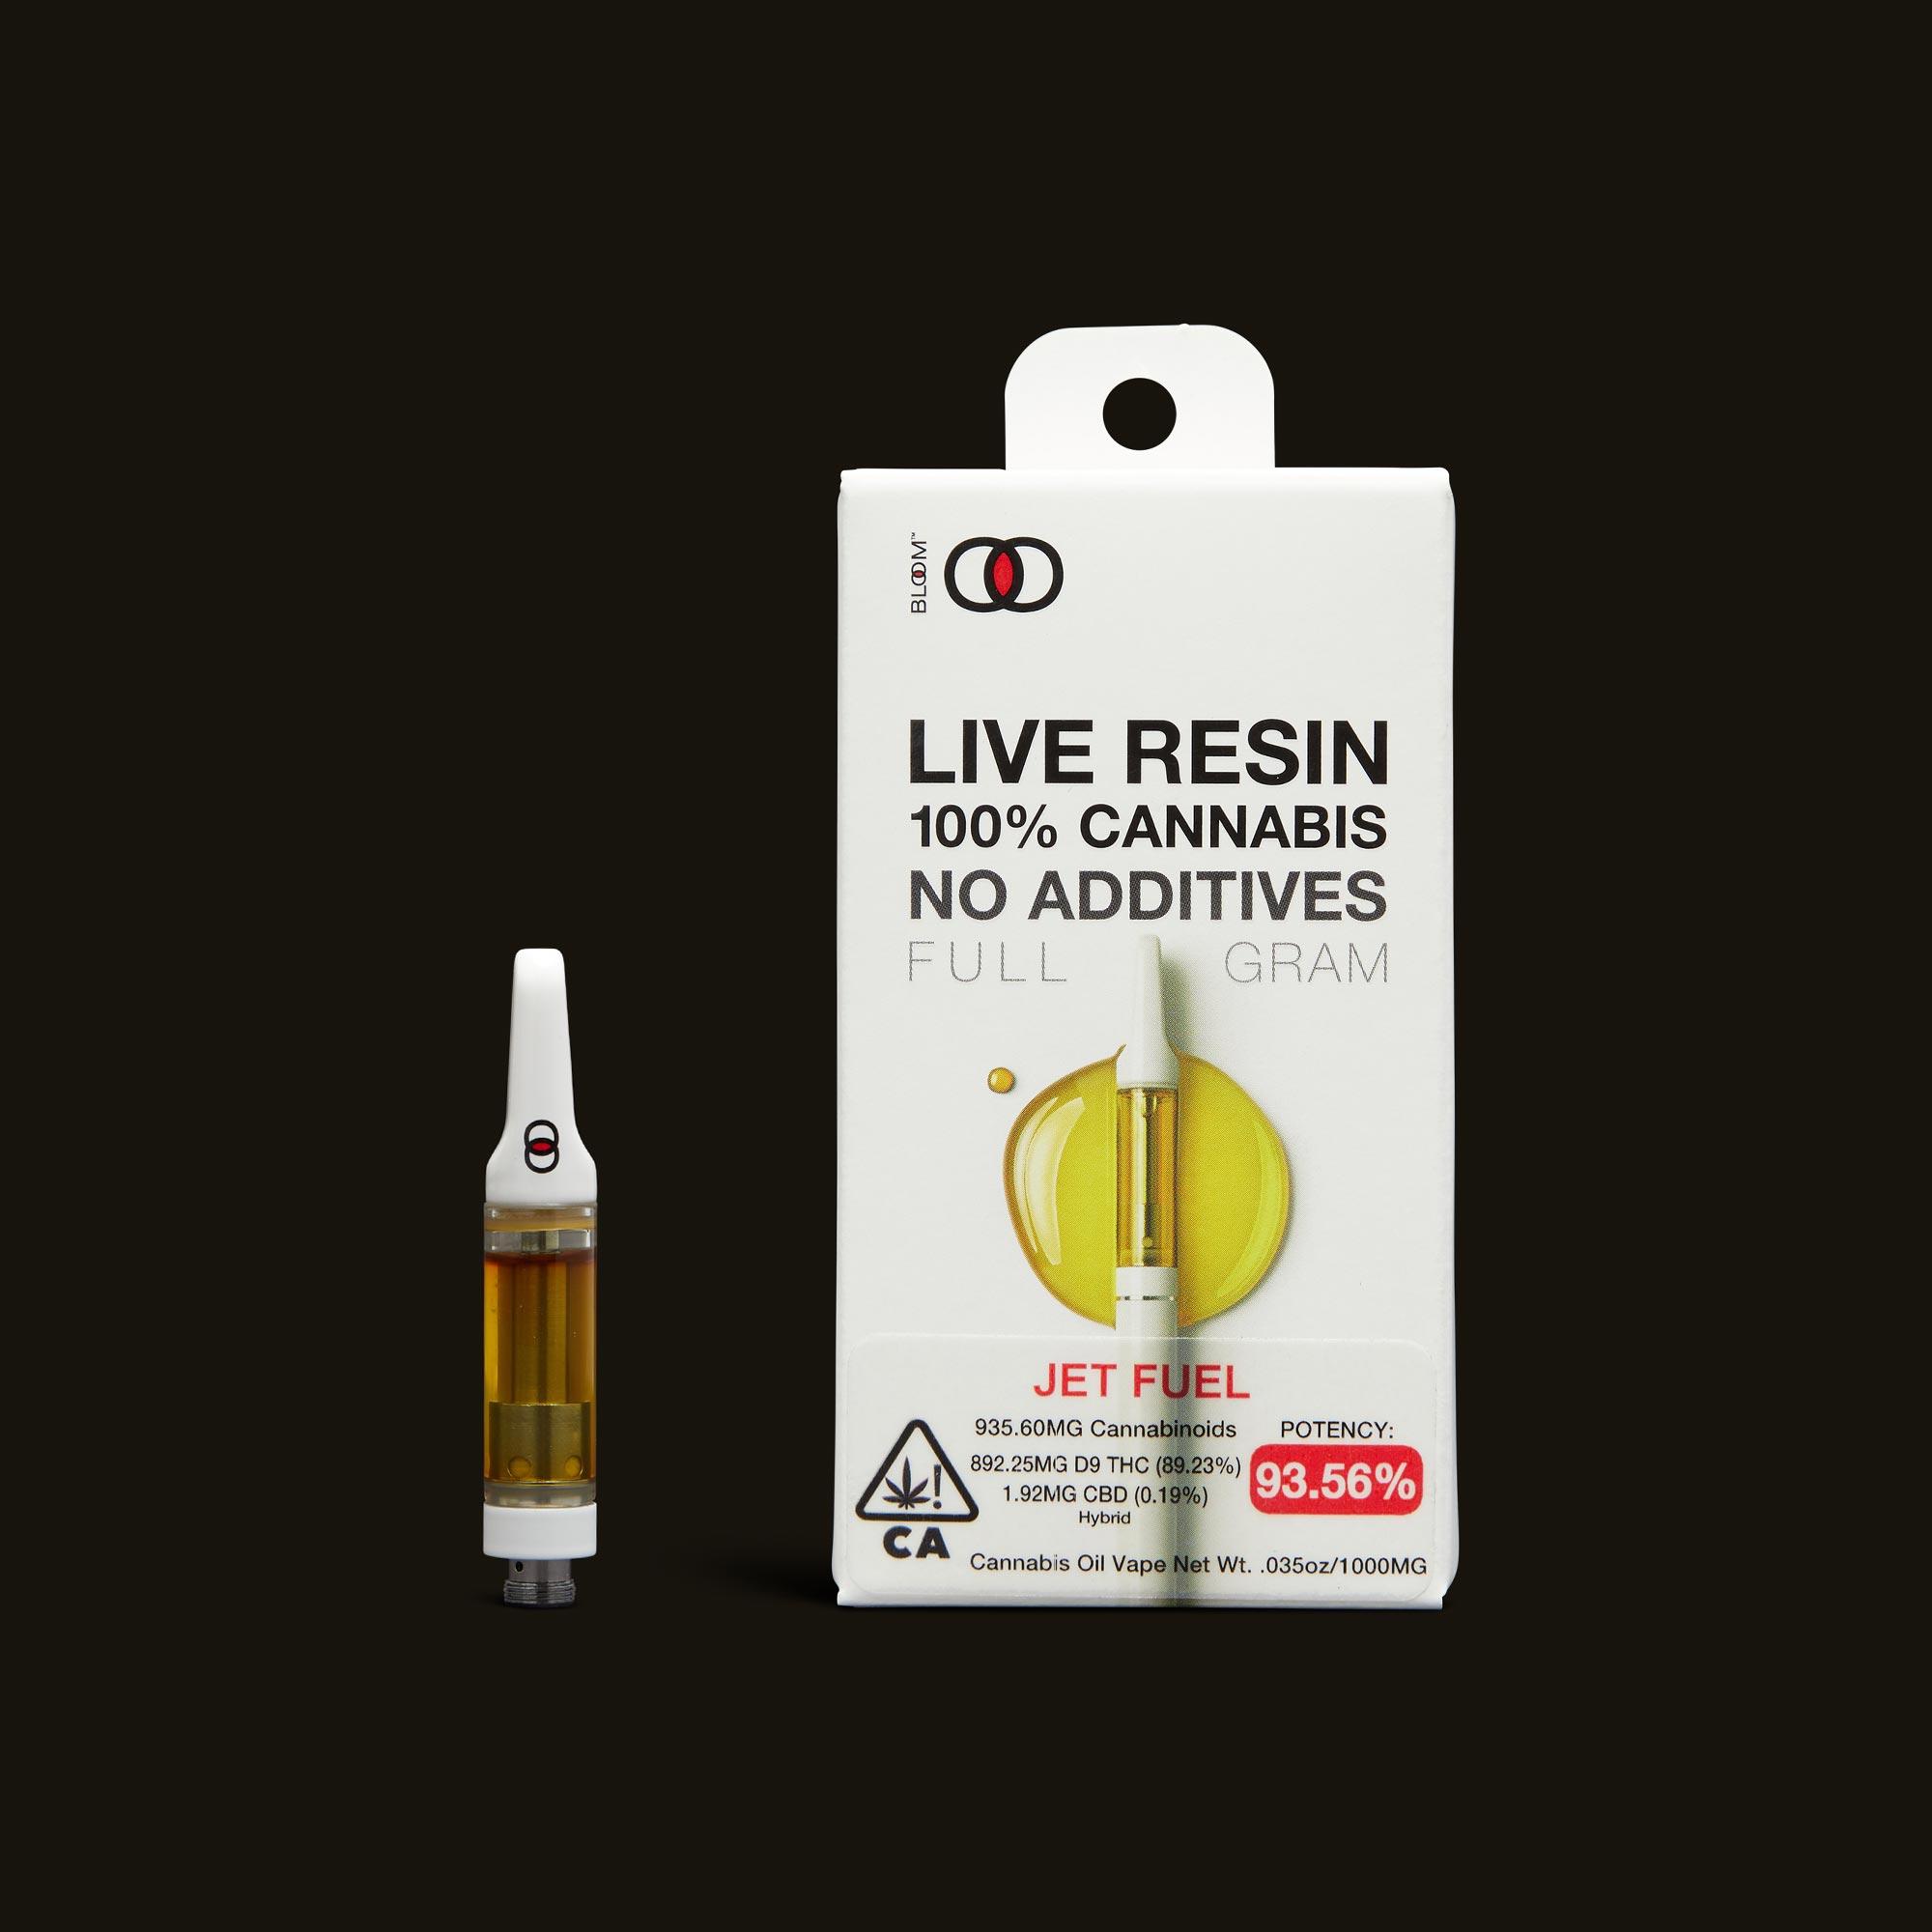 Bloom Brands Jet Fuel Live Resin Cartridge - 1g